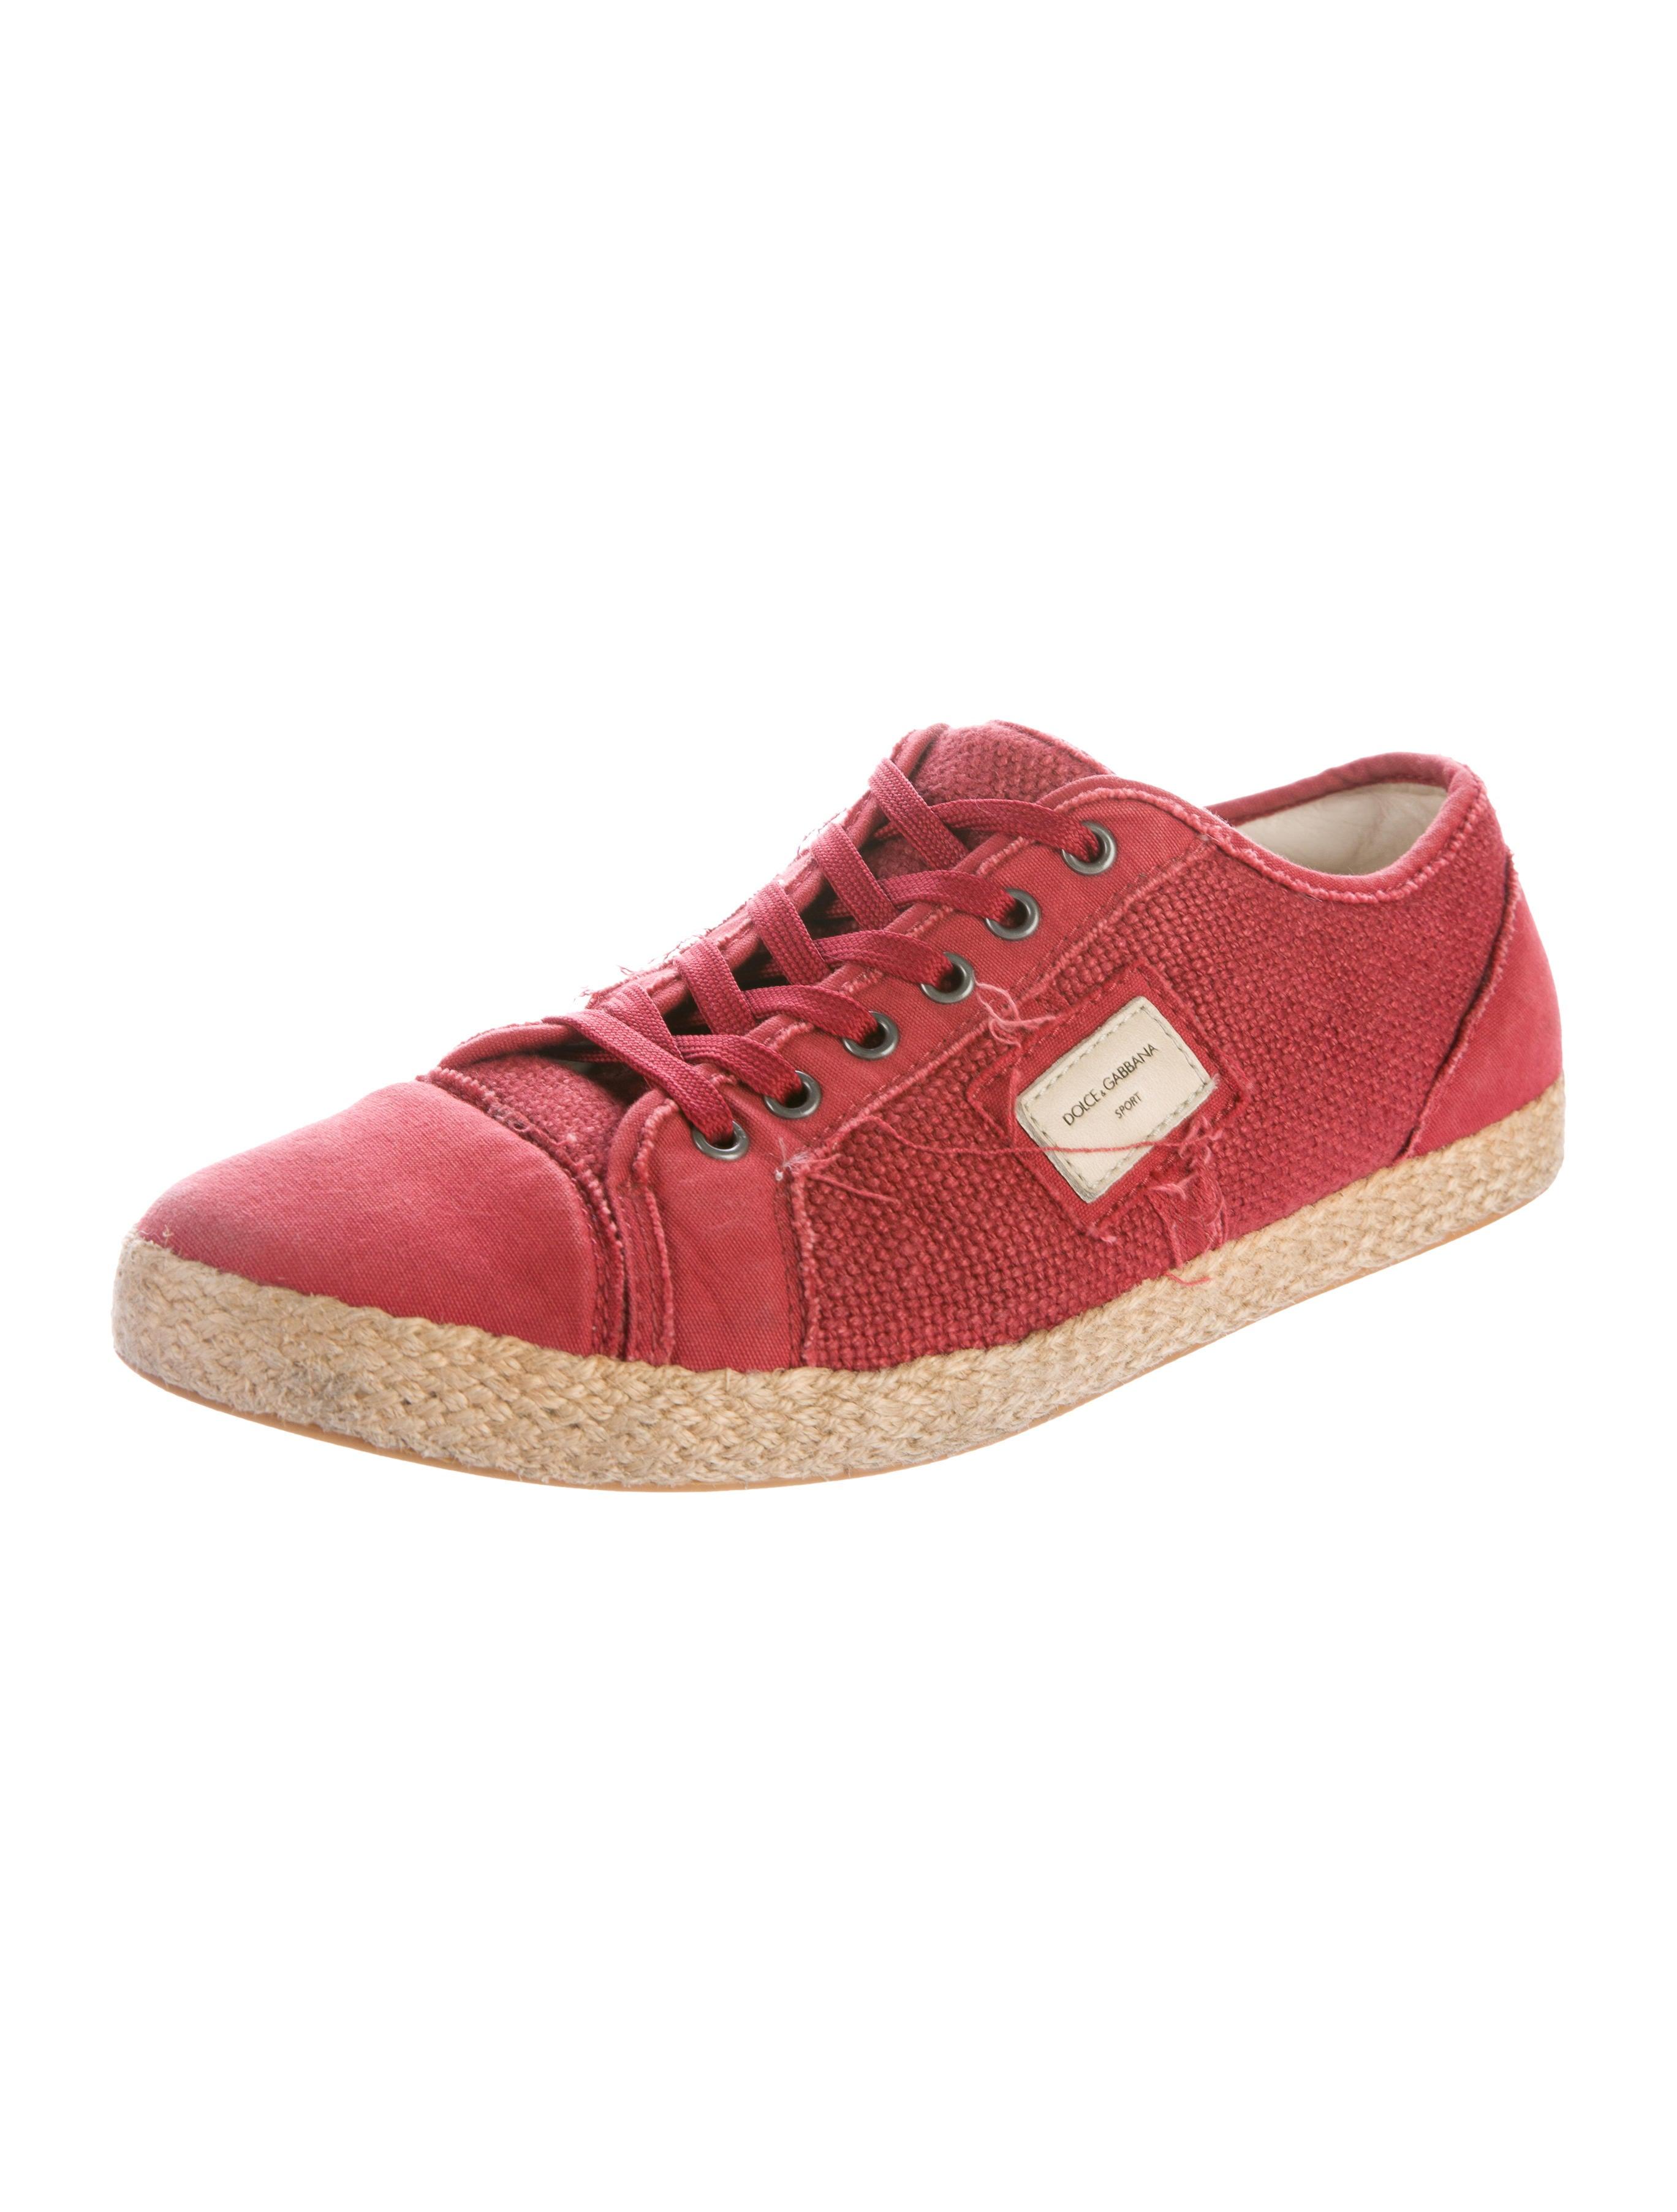 dolce gabbana sport espadrilles sneakers shoes